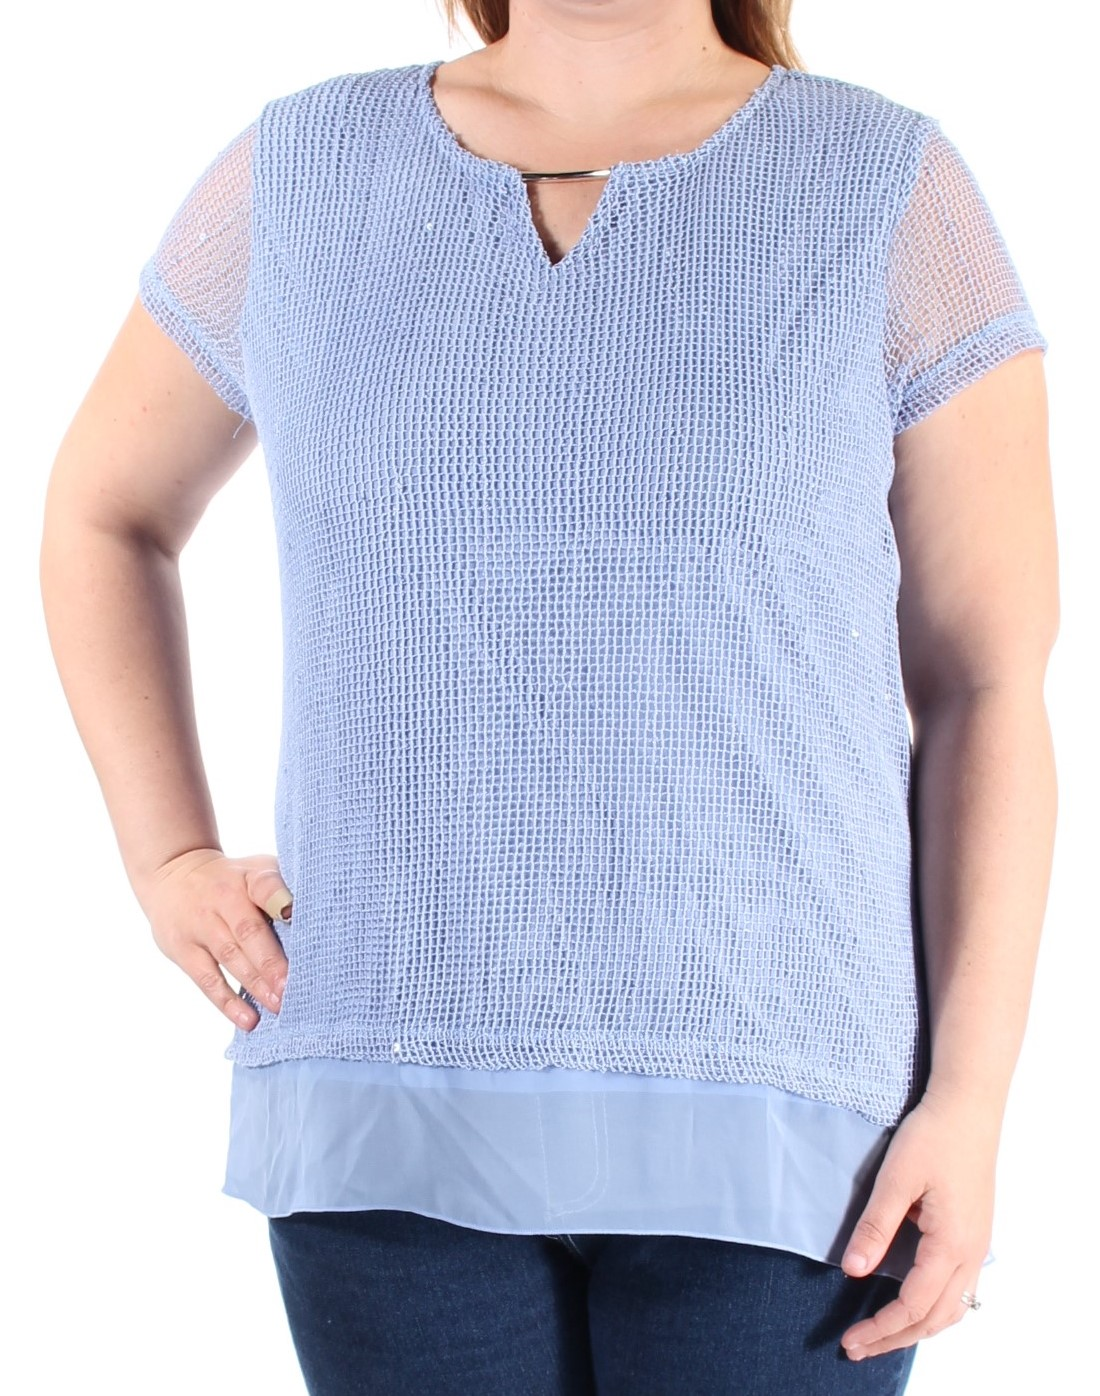 JM COLLECTION Womens Blue Sequined Mesh Cap Sleeve Keyhole Top  Size: L